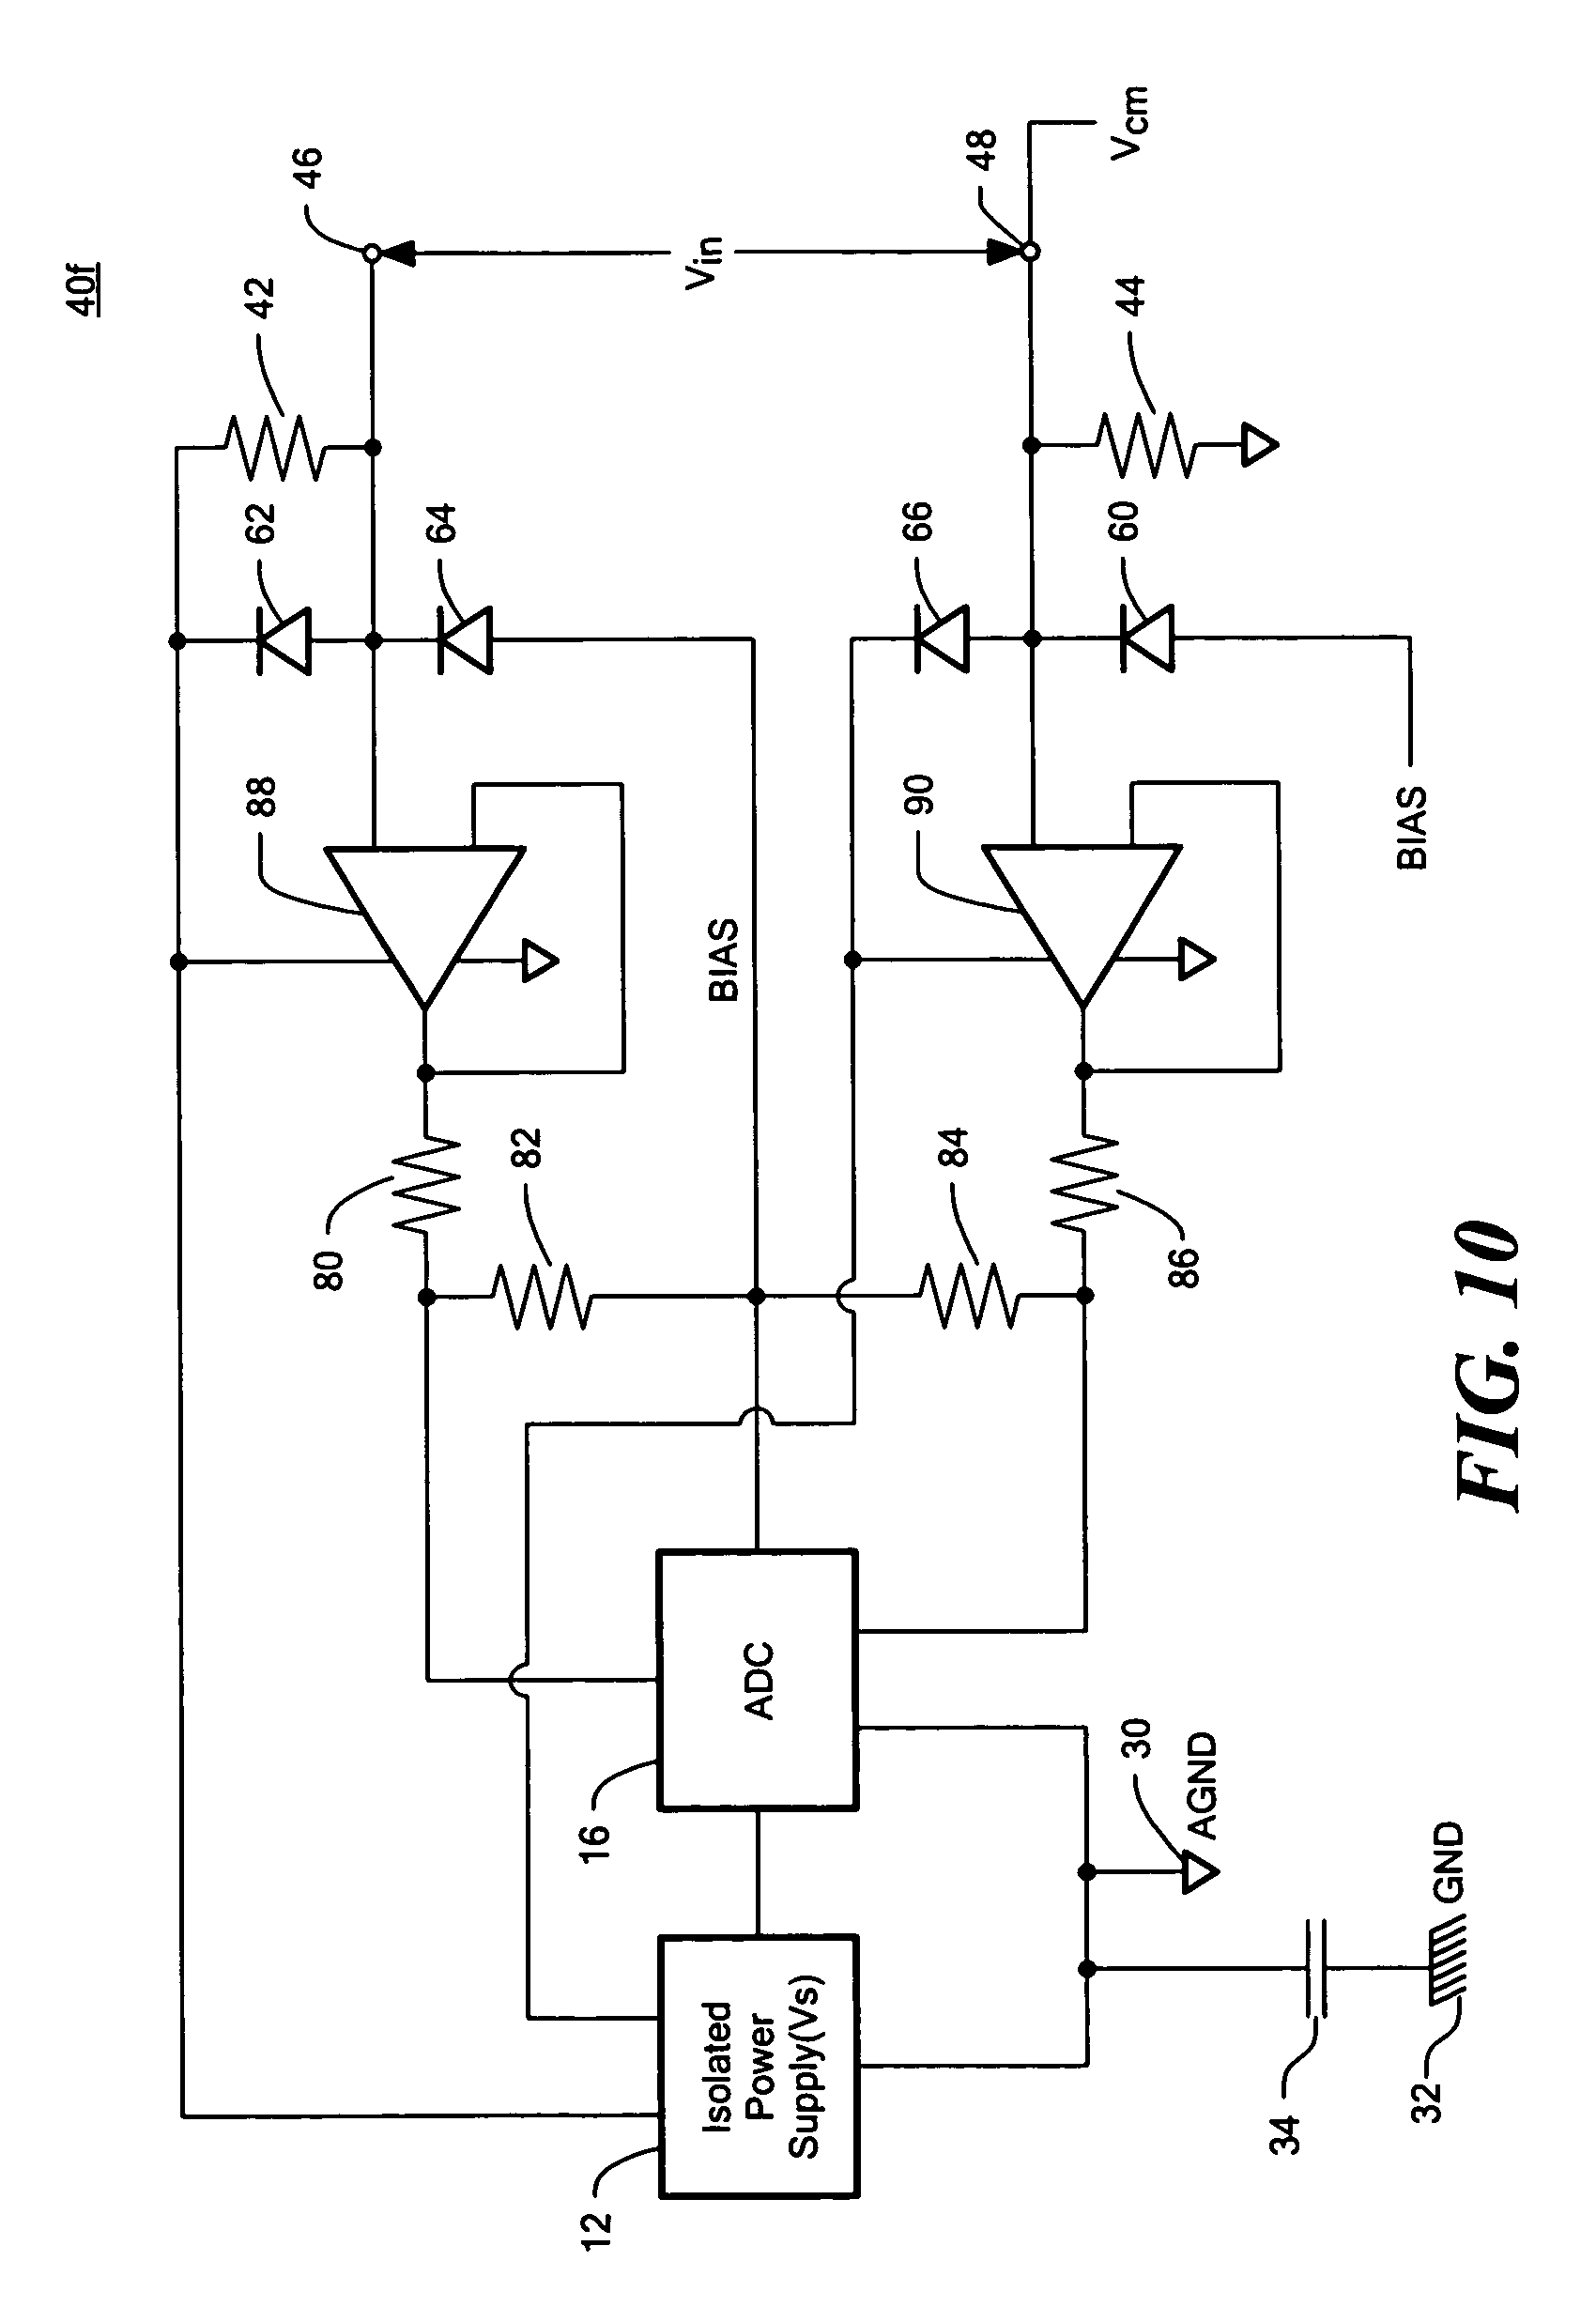 1756 ib16 wiring diagram